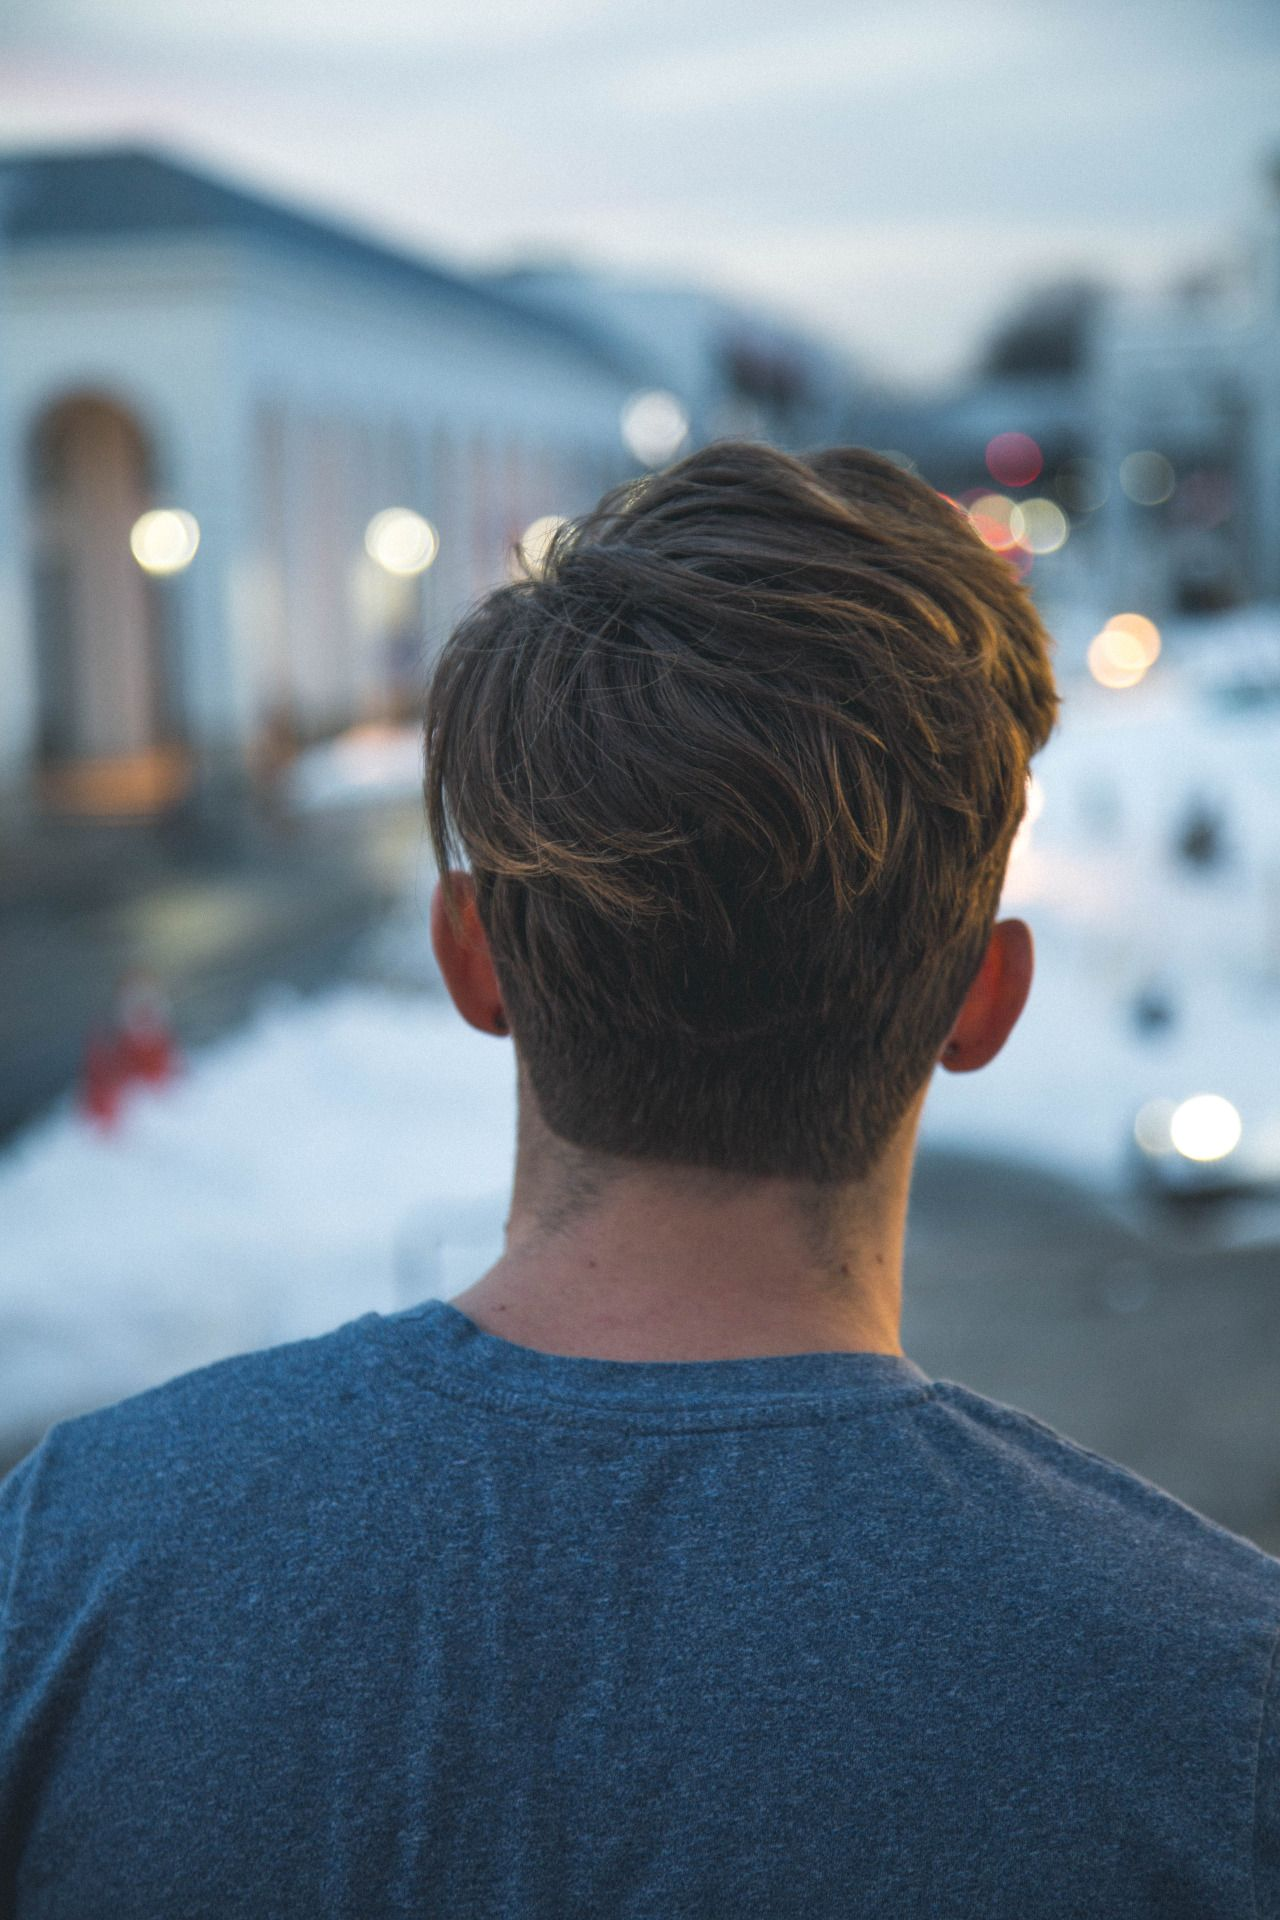 Haircut for boys back view back view cut  hair styles  pinterest  long wavy hair haircuts